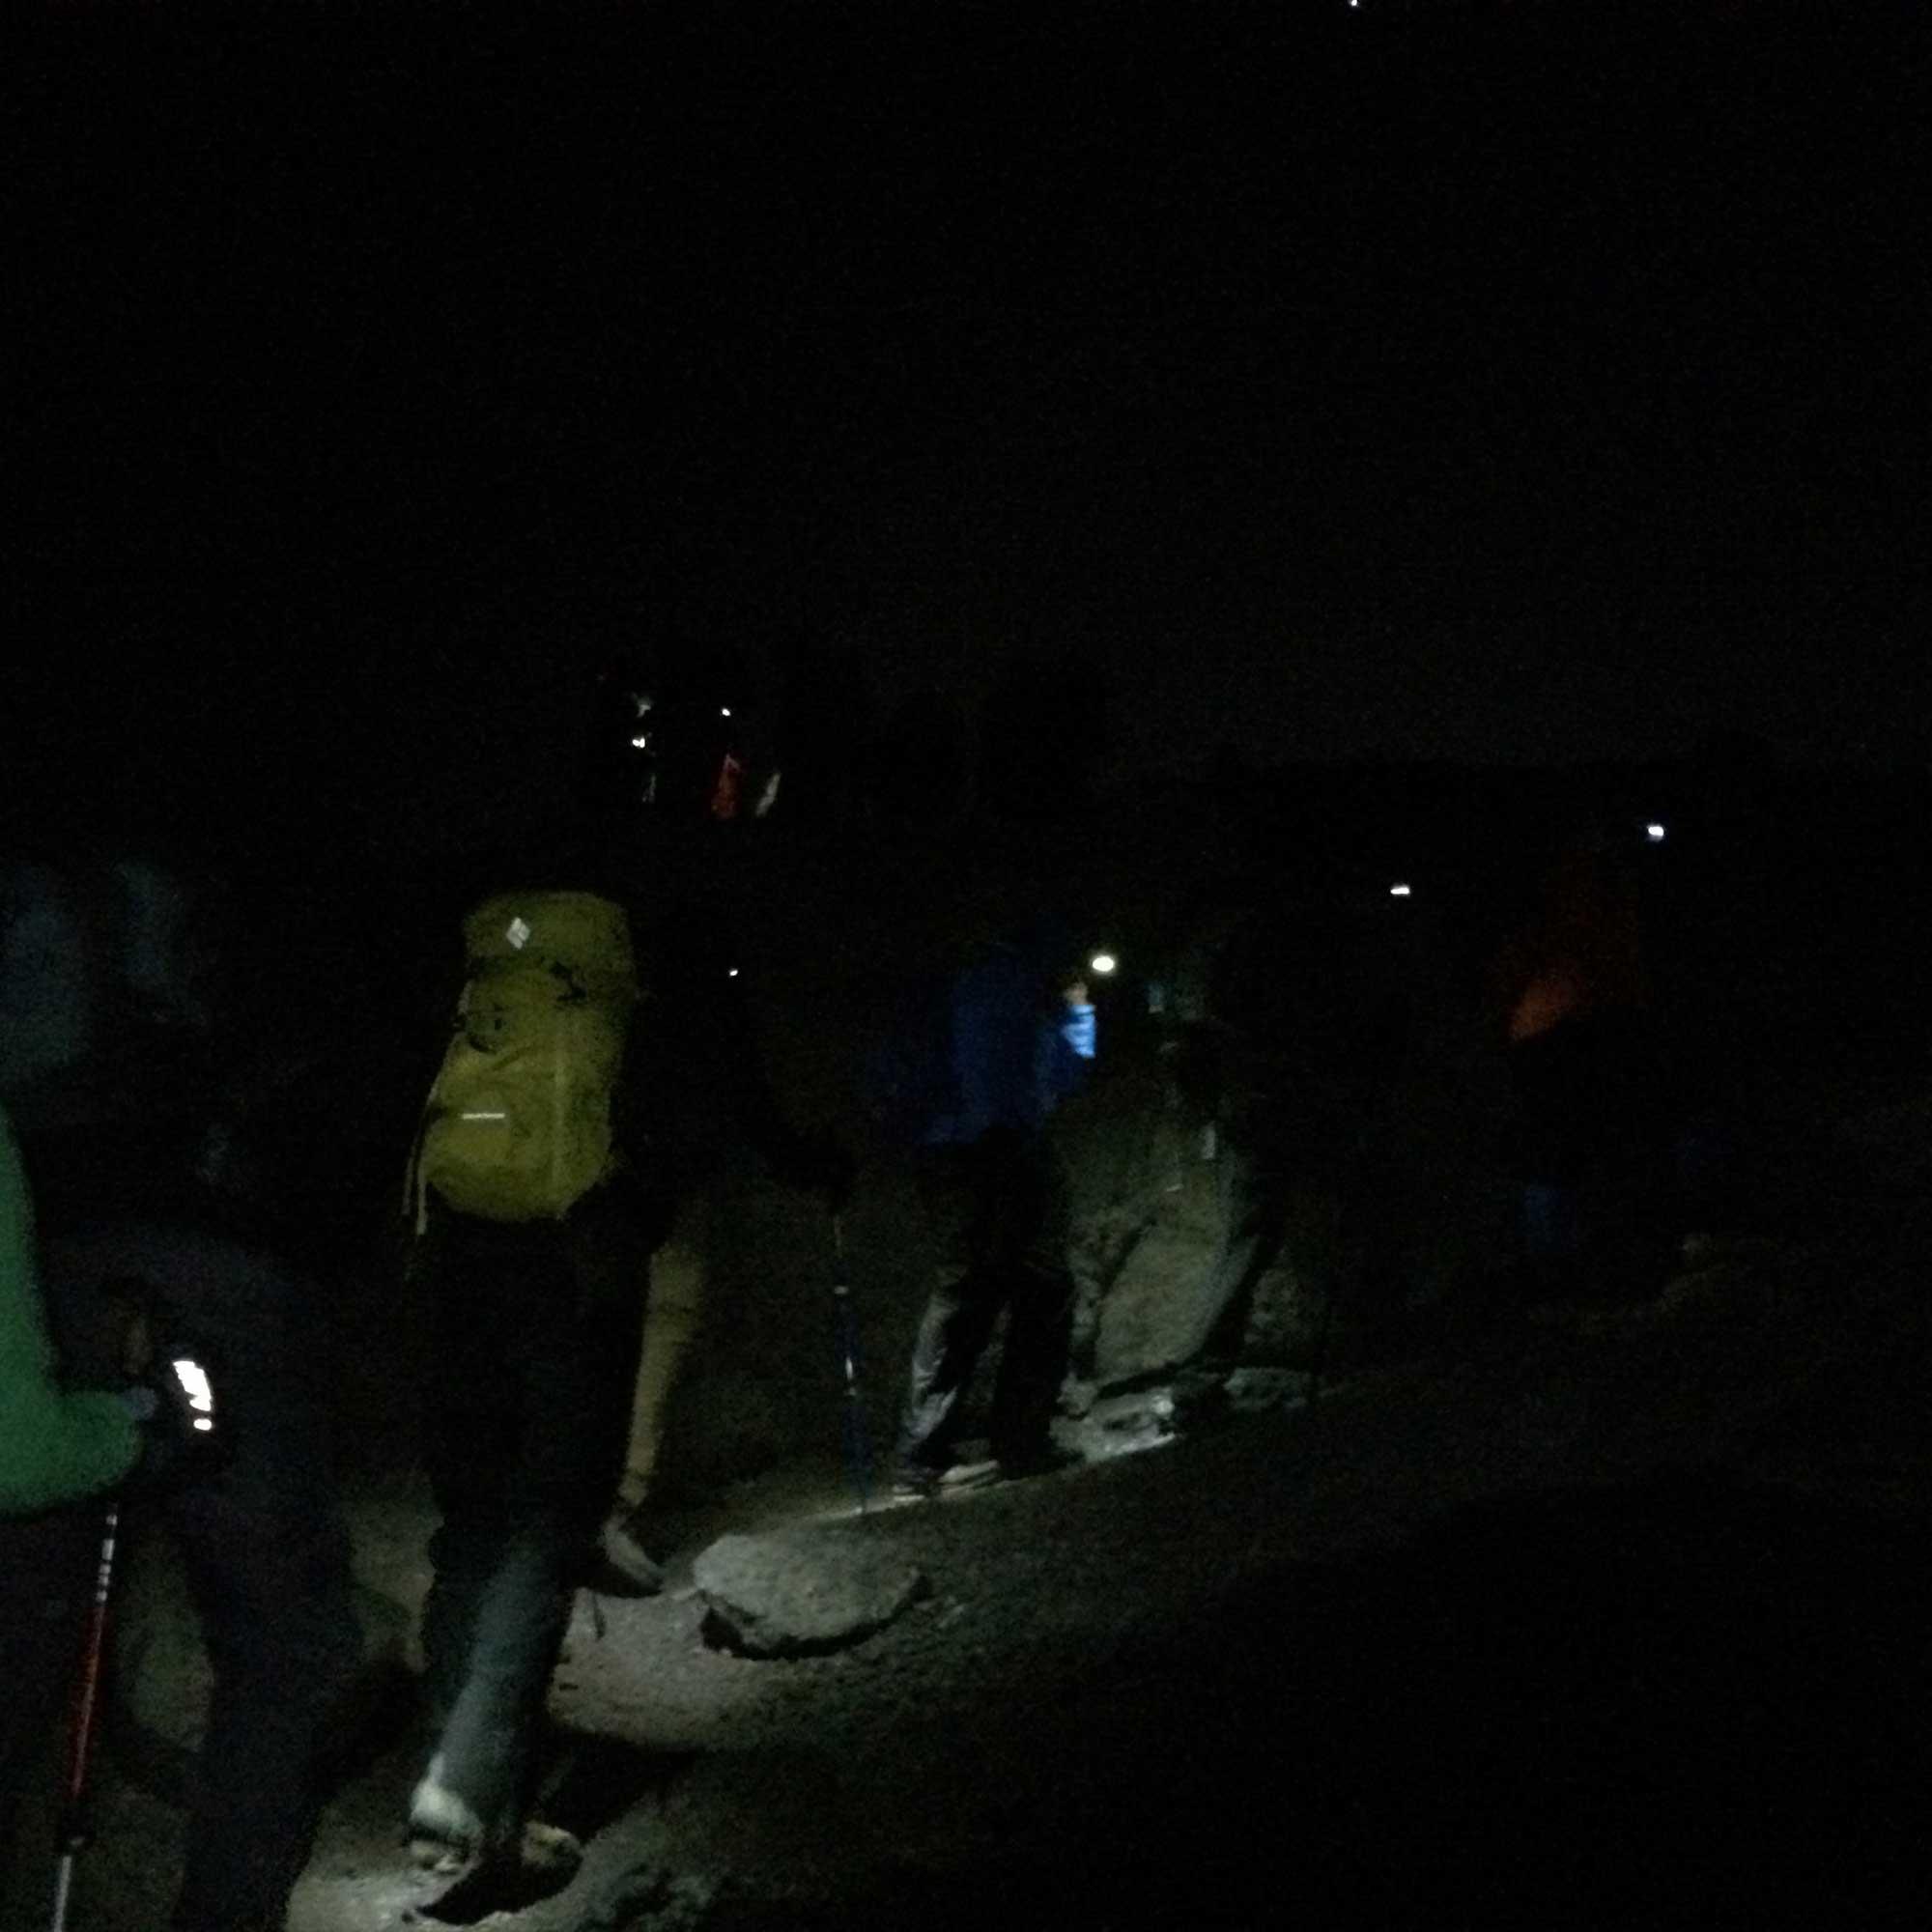 Kilimanjaro climbers beginning summit push at night